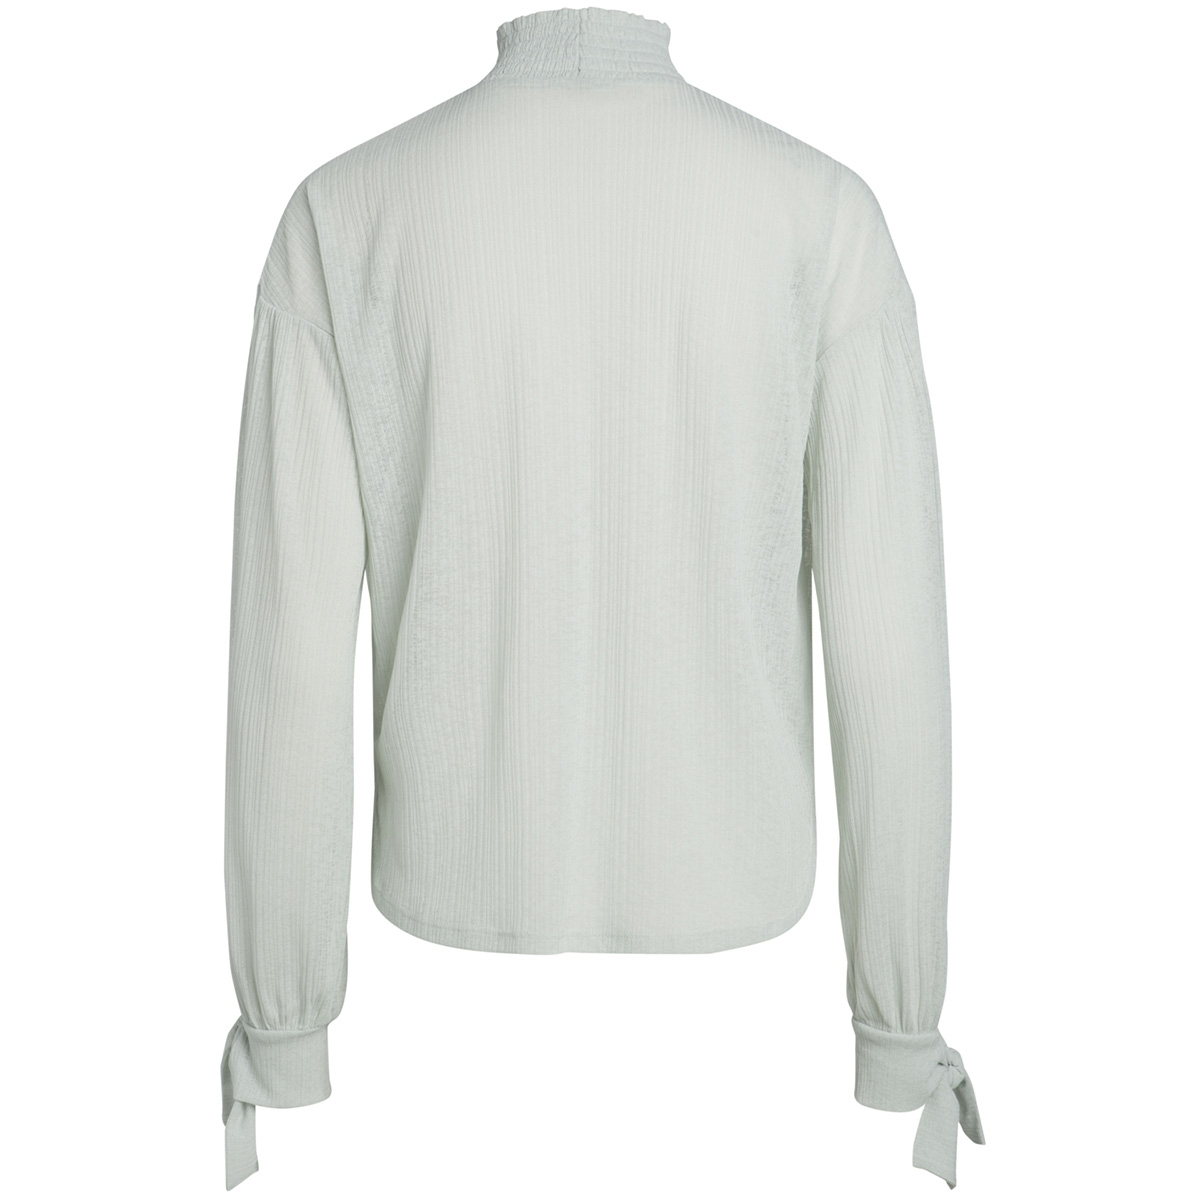 pcdilma ls blouse camp 17088599 pieces t-shirt sky gray